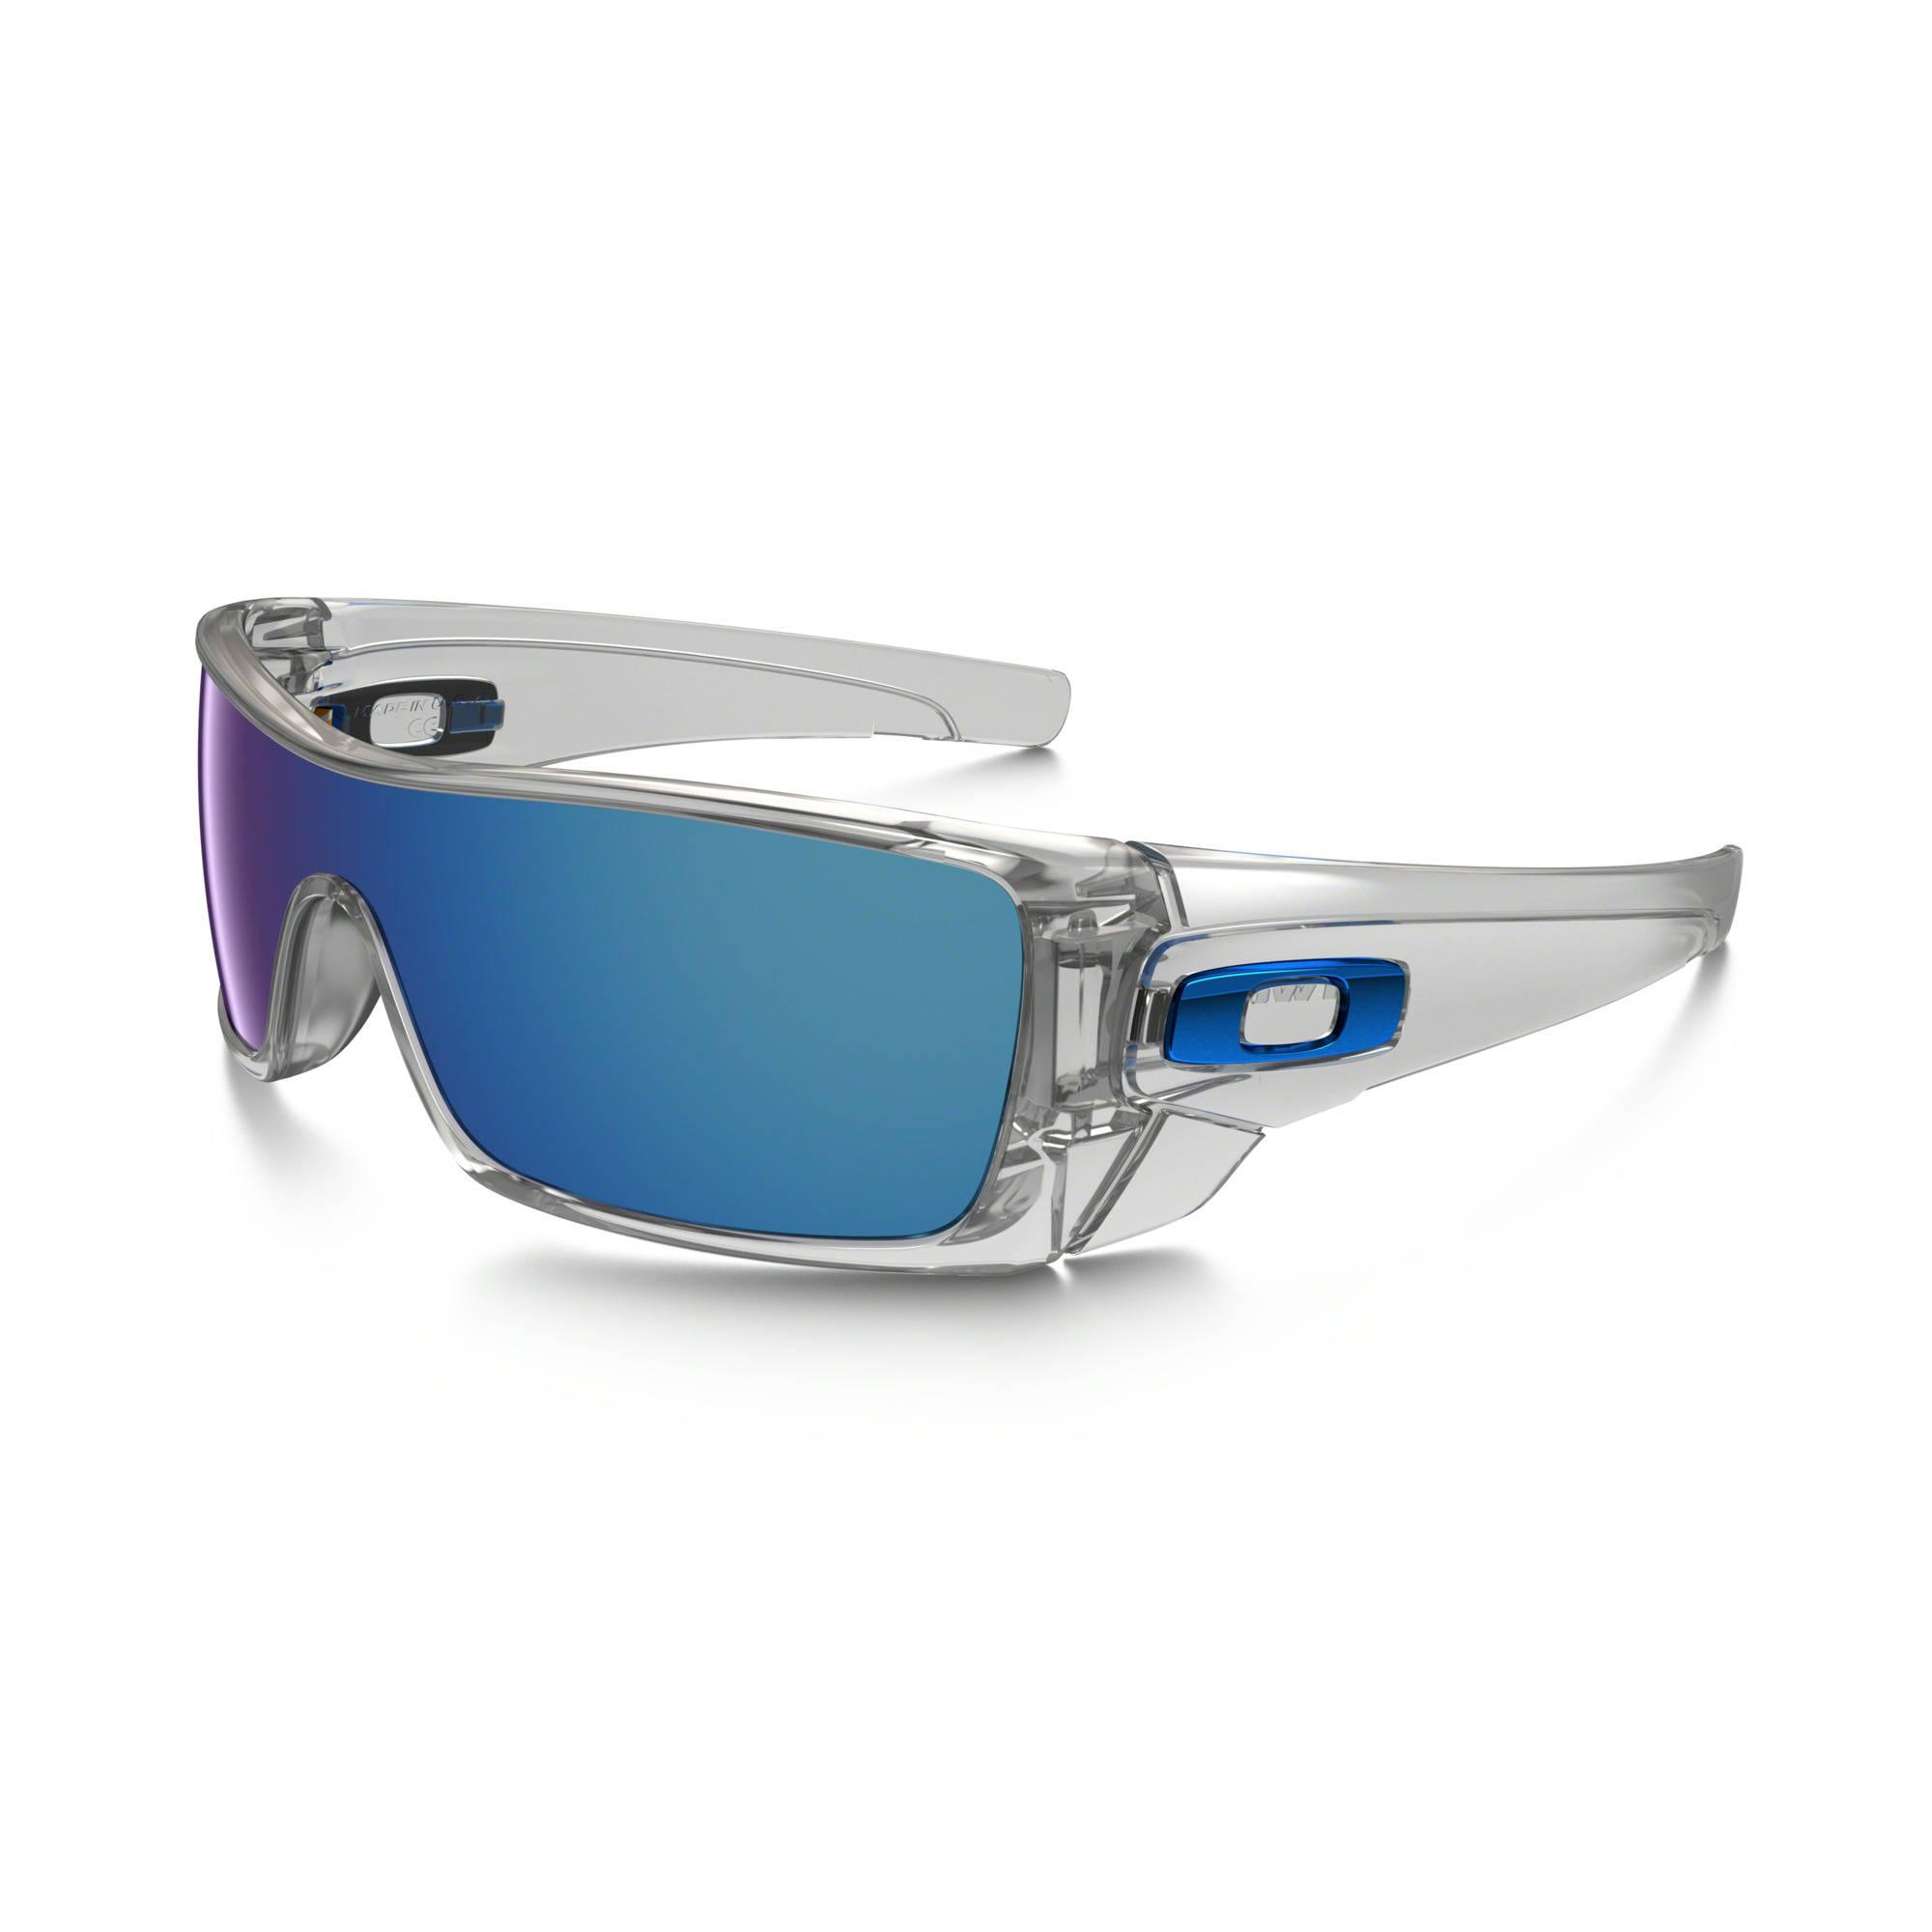 Oakley Batwolf Sunglasses 0oo9101 91010727 B Amp H Photo Video